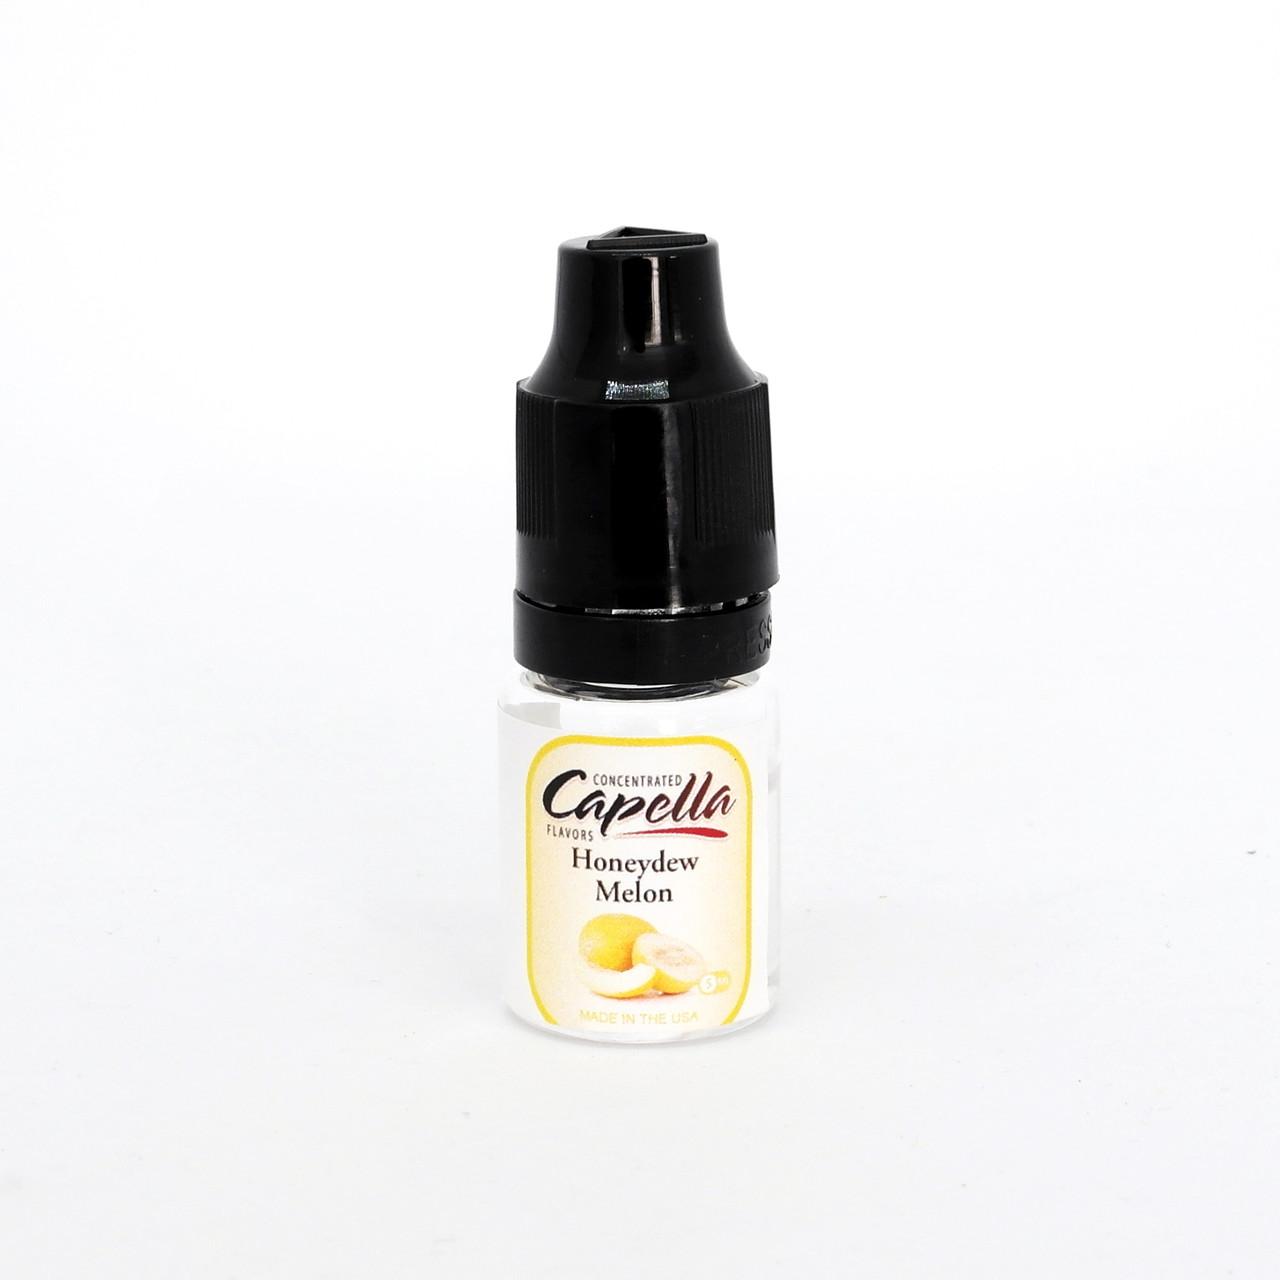 Ароматизатор Capella Honeydew Melon (Медовая дыня) 5 мл. (0215)